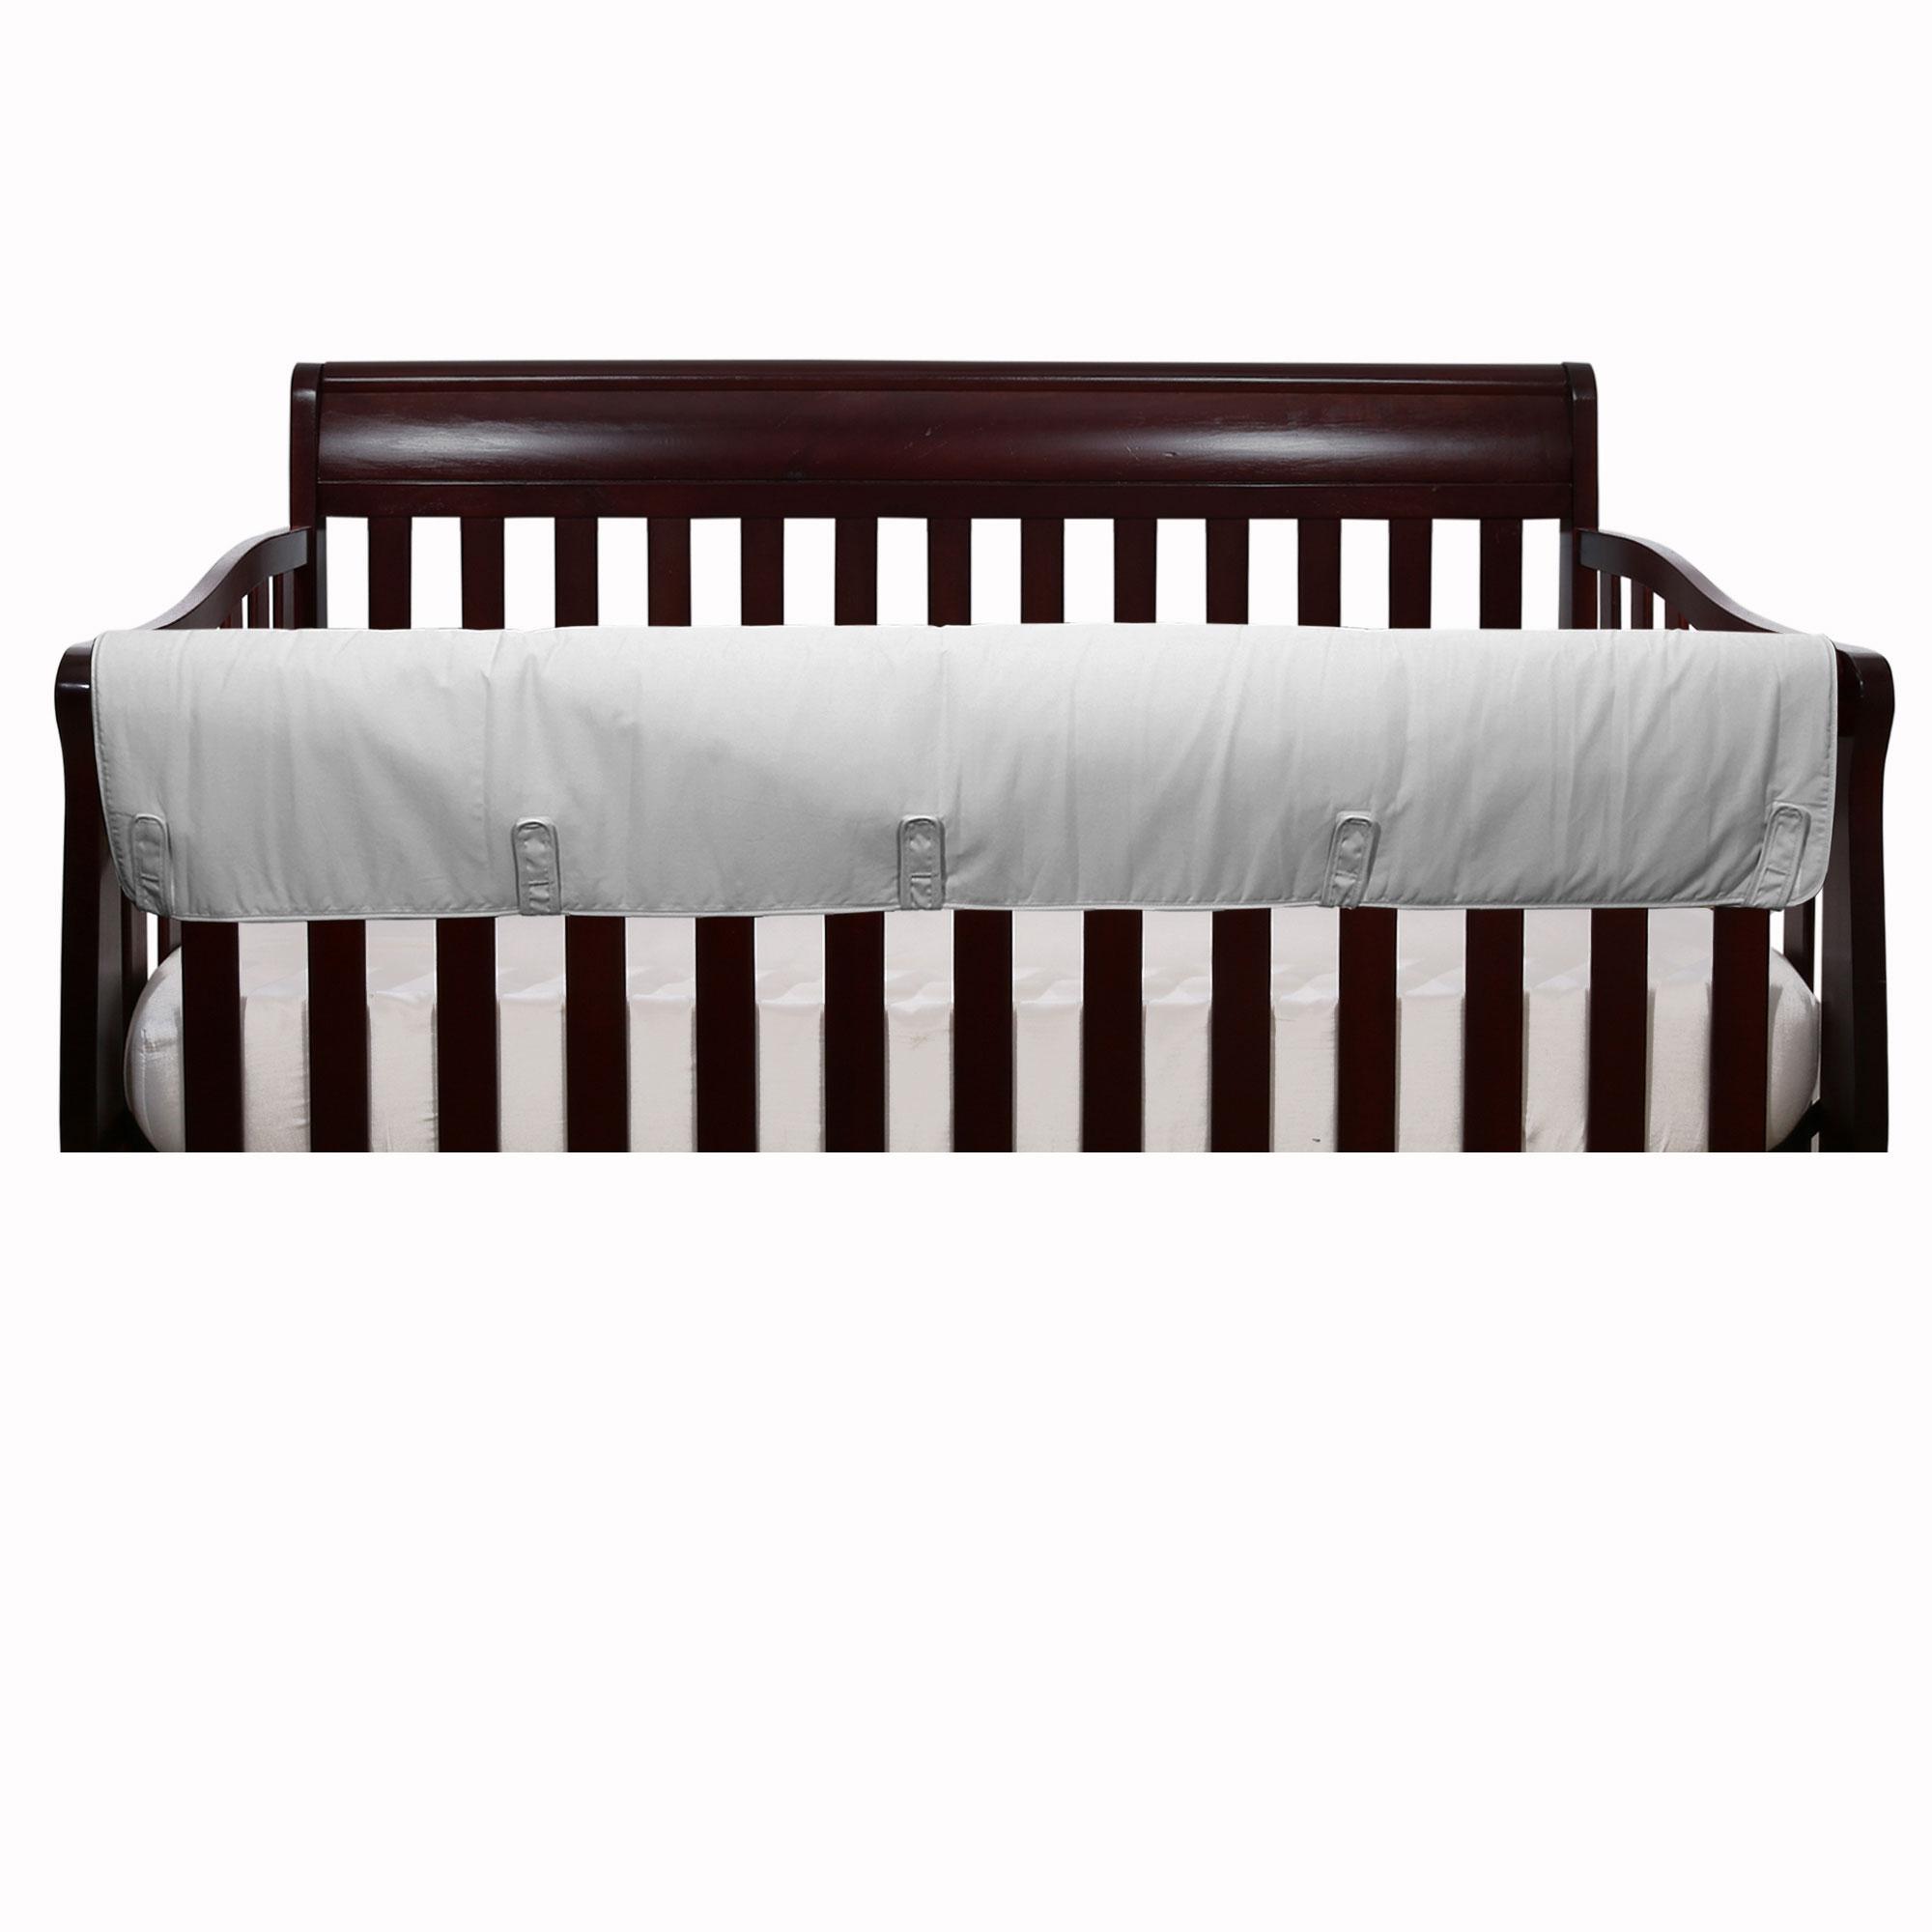 Solid Grey Front Crib Rail Teething Guard Padded Protector - 100% Cotton Fabrics